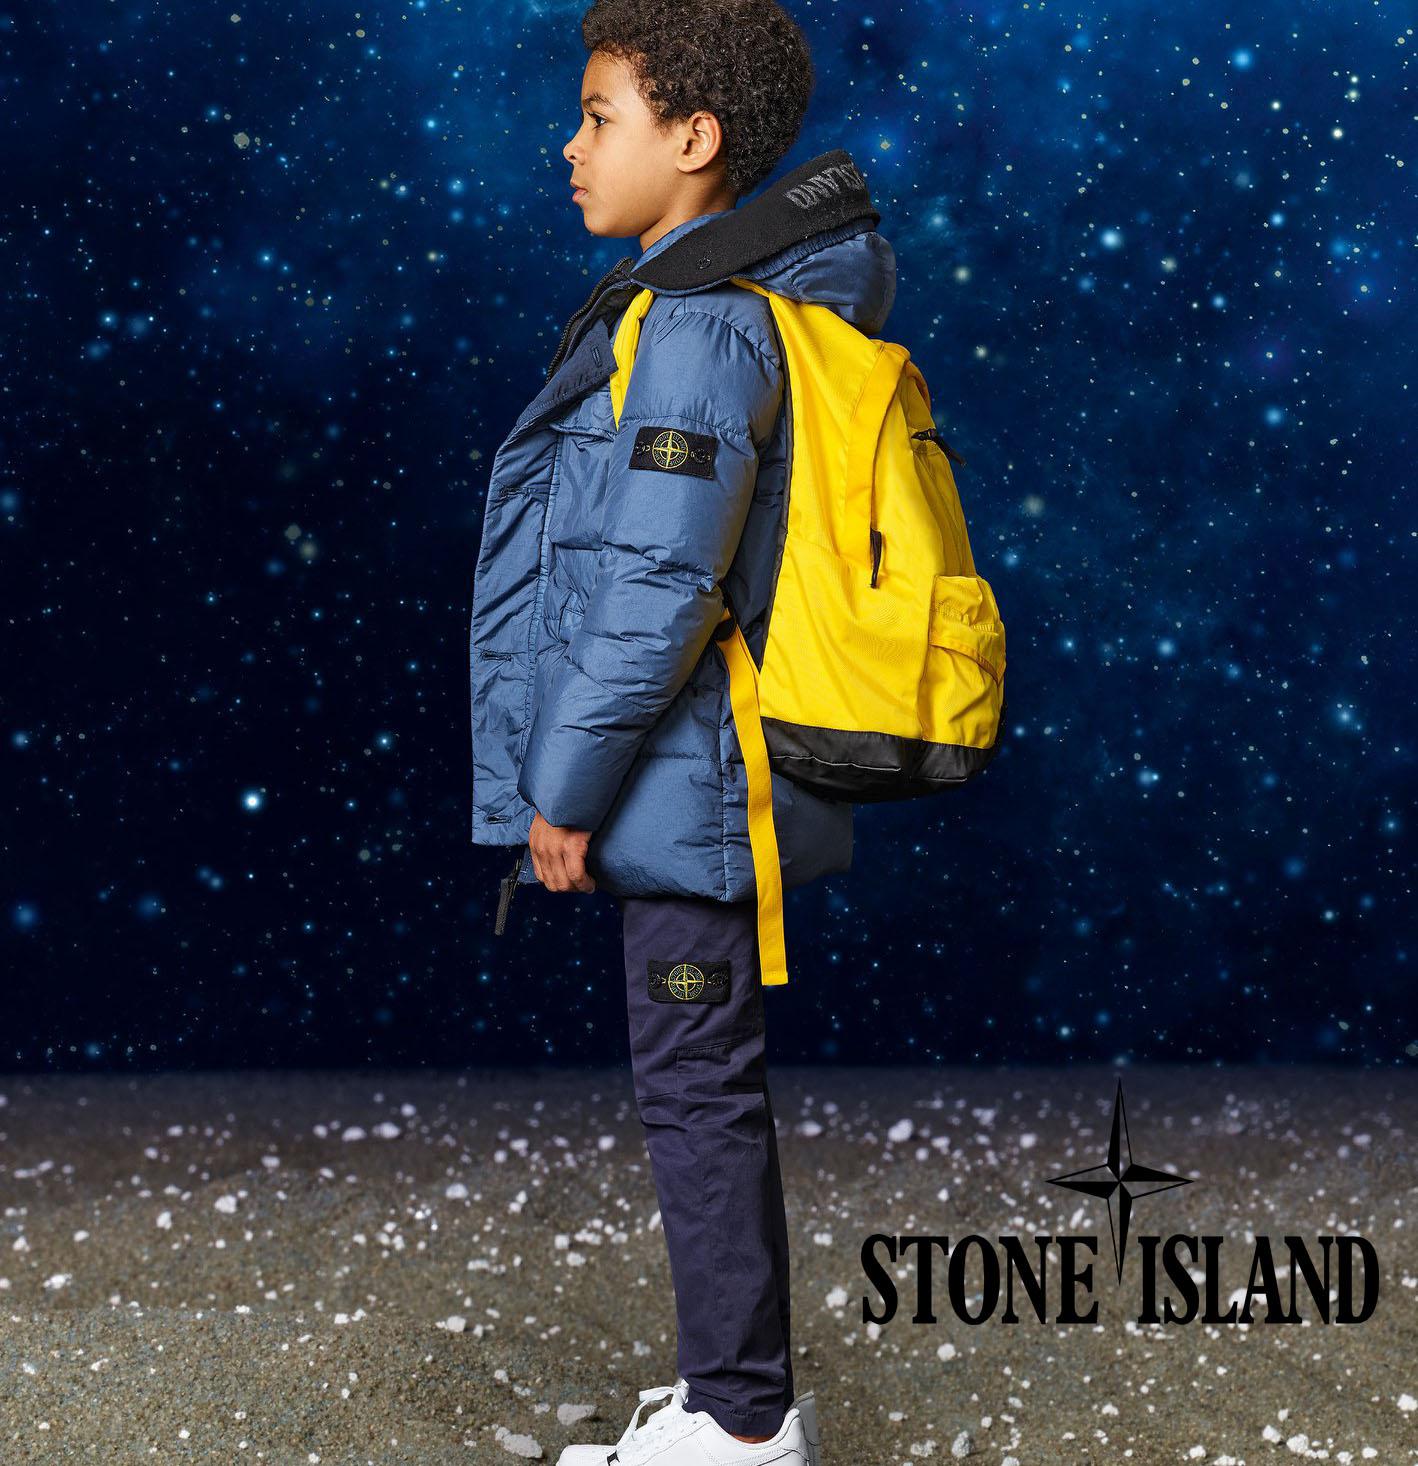 https://www.virno.it/it/tutti/designer/stone-island/